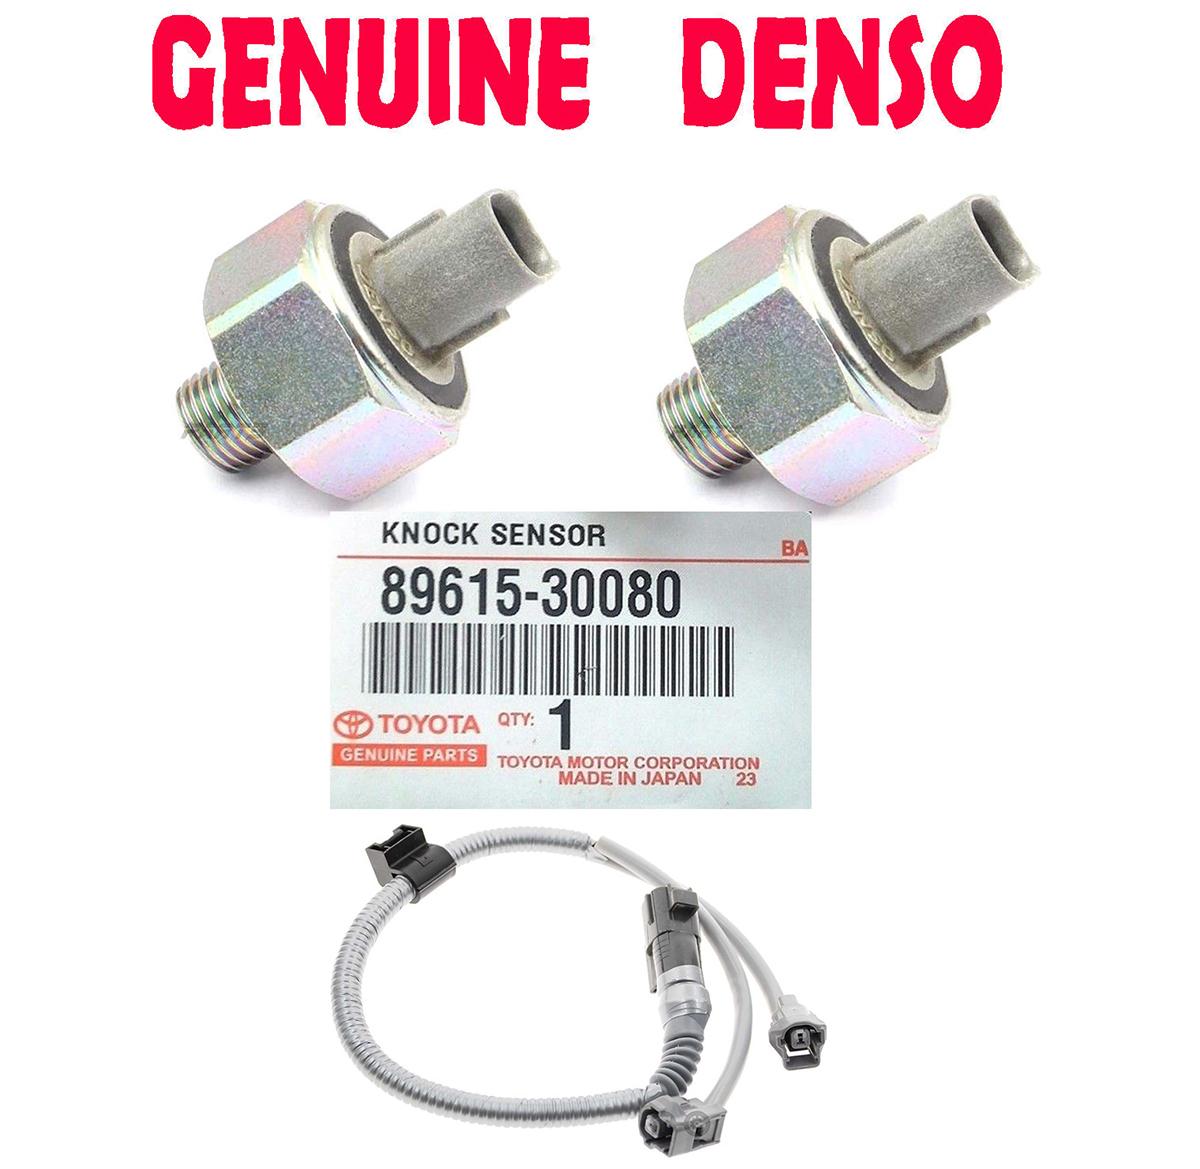 2xgenuine Oem Knock Sensor For Ls430 Sc430 Rav4 Lexus Gs43 Solara 89615